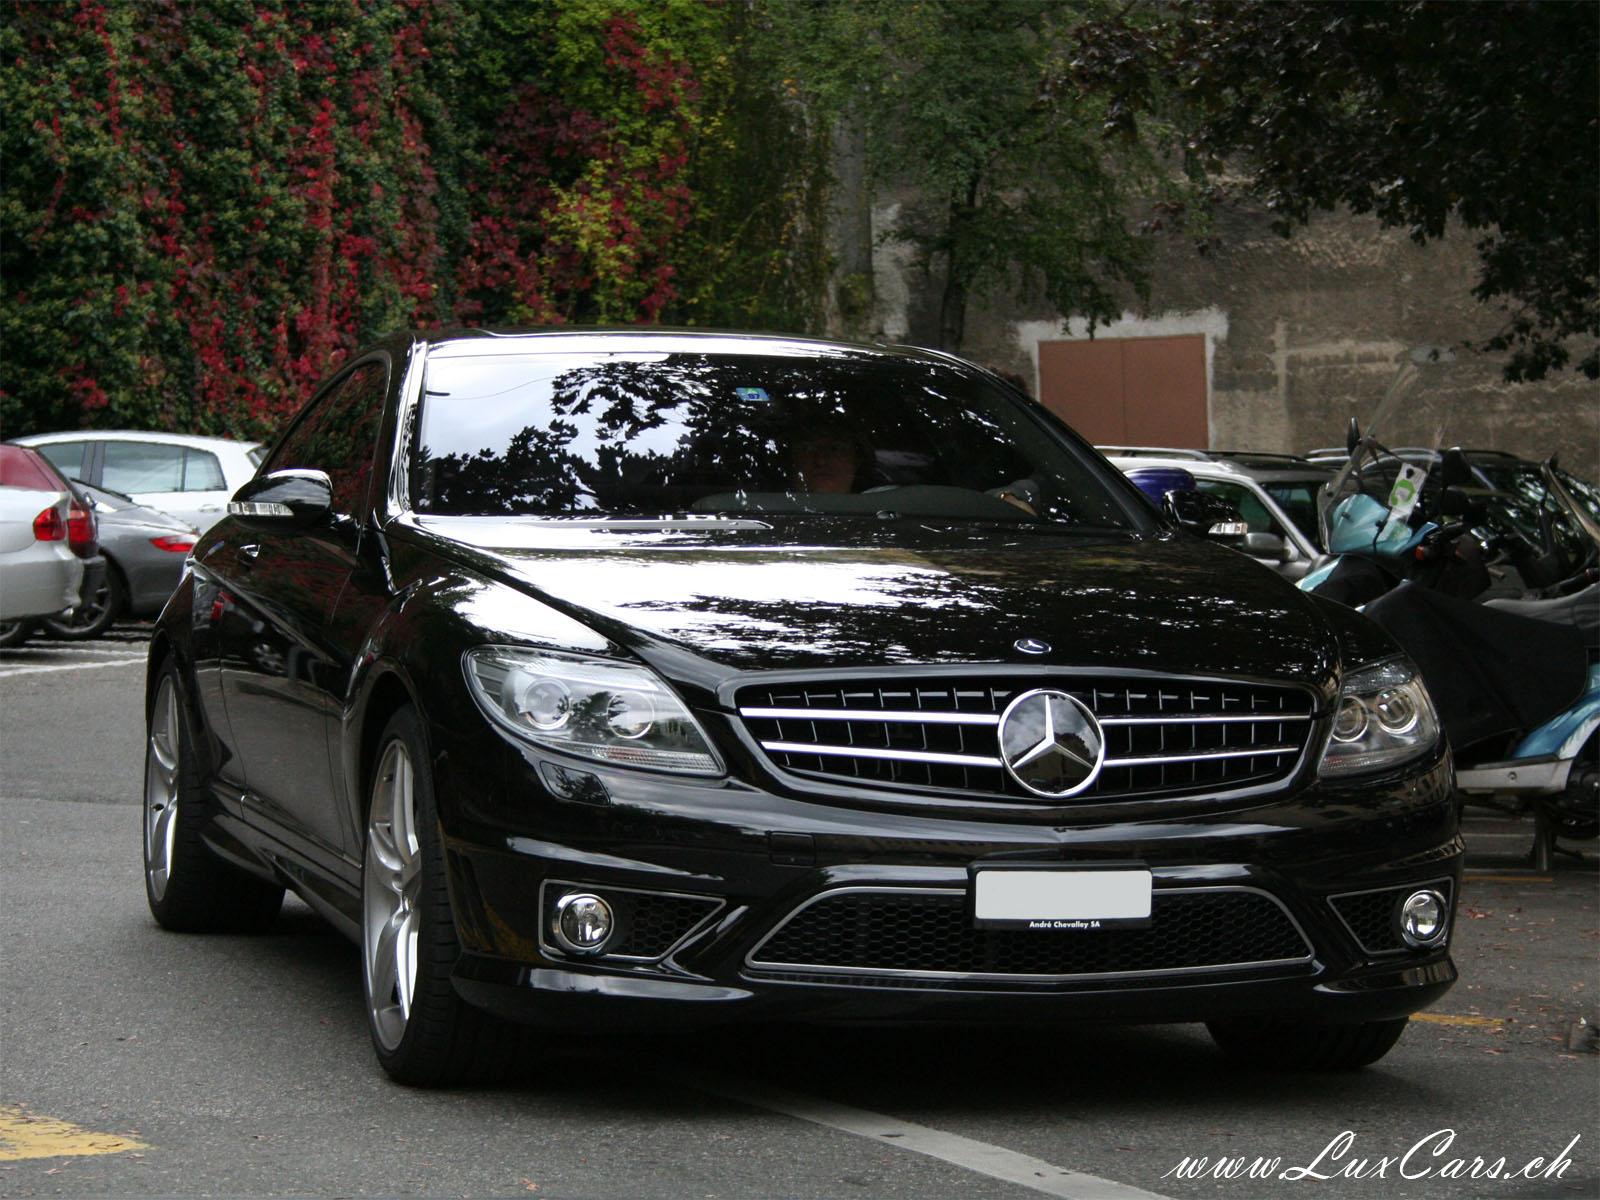 http://2.bp.blogspot.com/-LSdYDhRcQ9k/UJjF2jenKHI/AAAAAAAAB9U/_CywtenMqF8/s1600/Mercedes-Benz-CL63-AMG.jpg